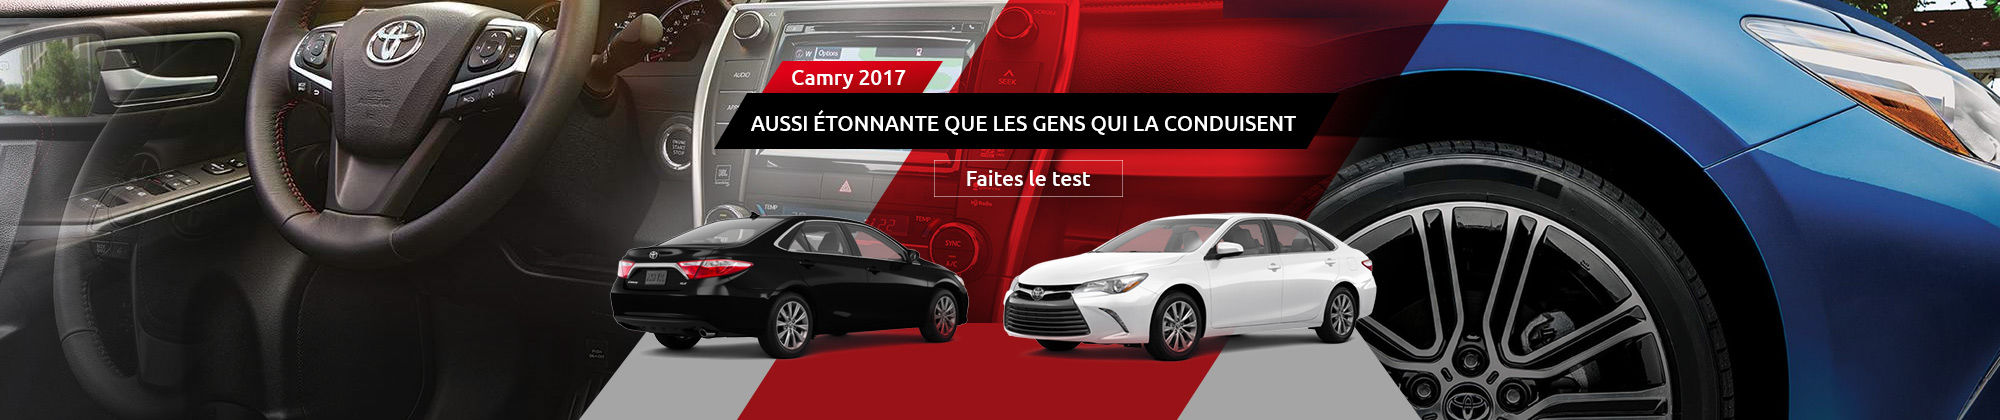 Camry 2017